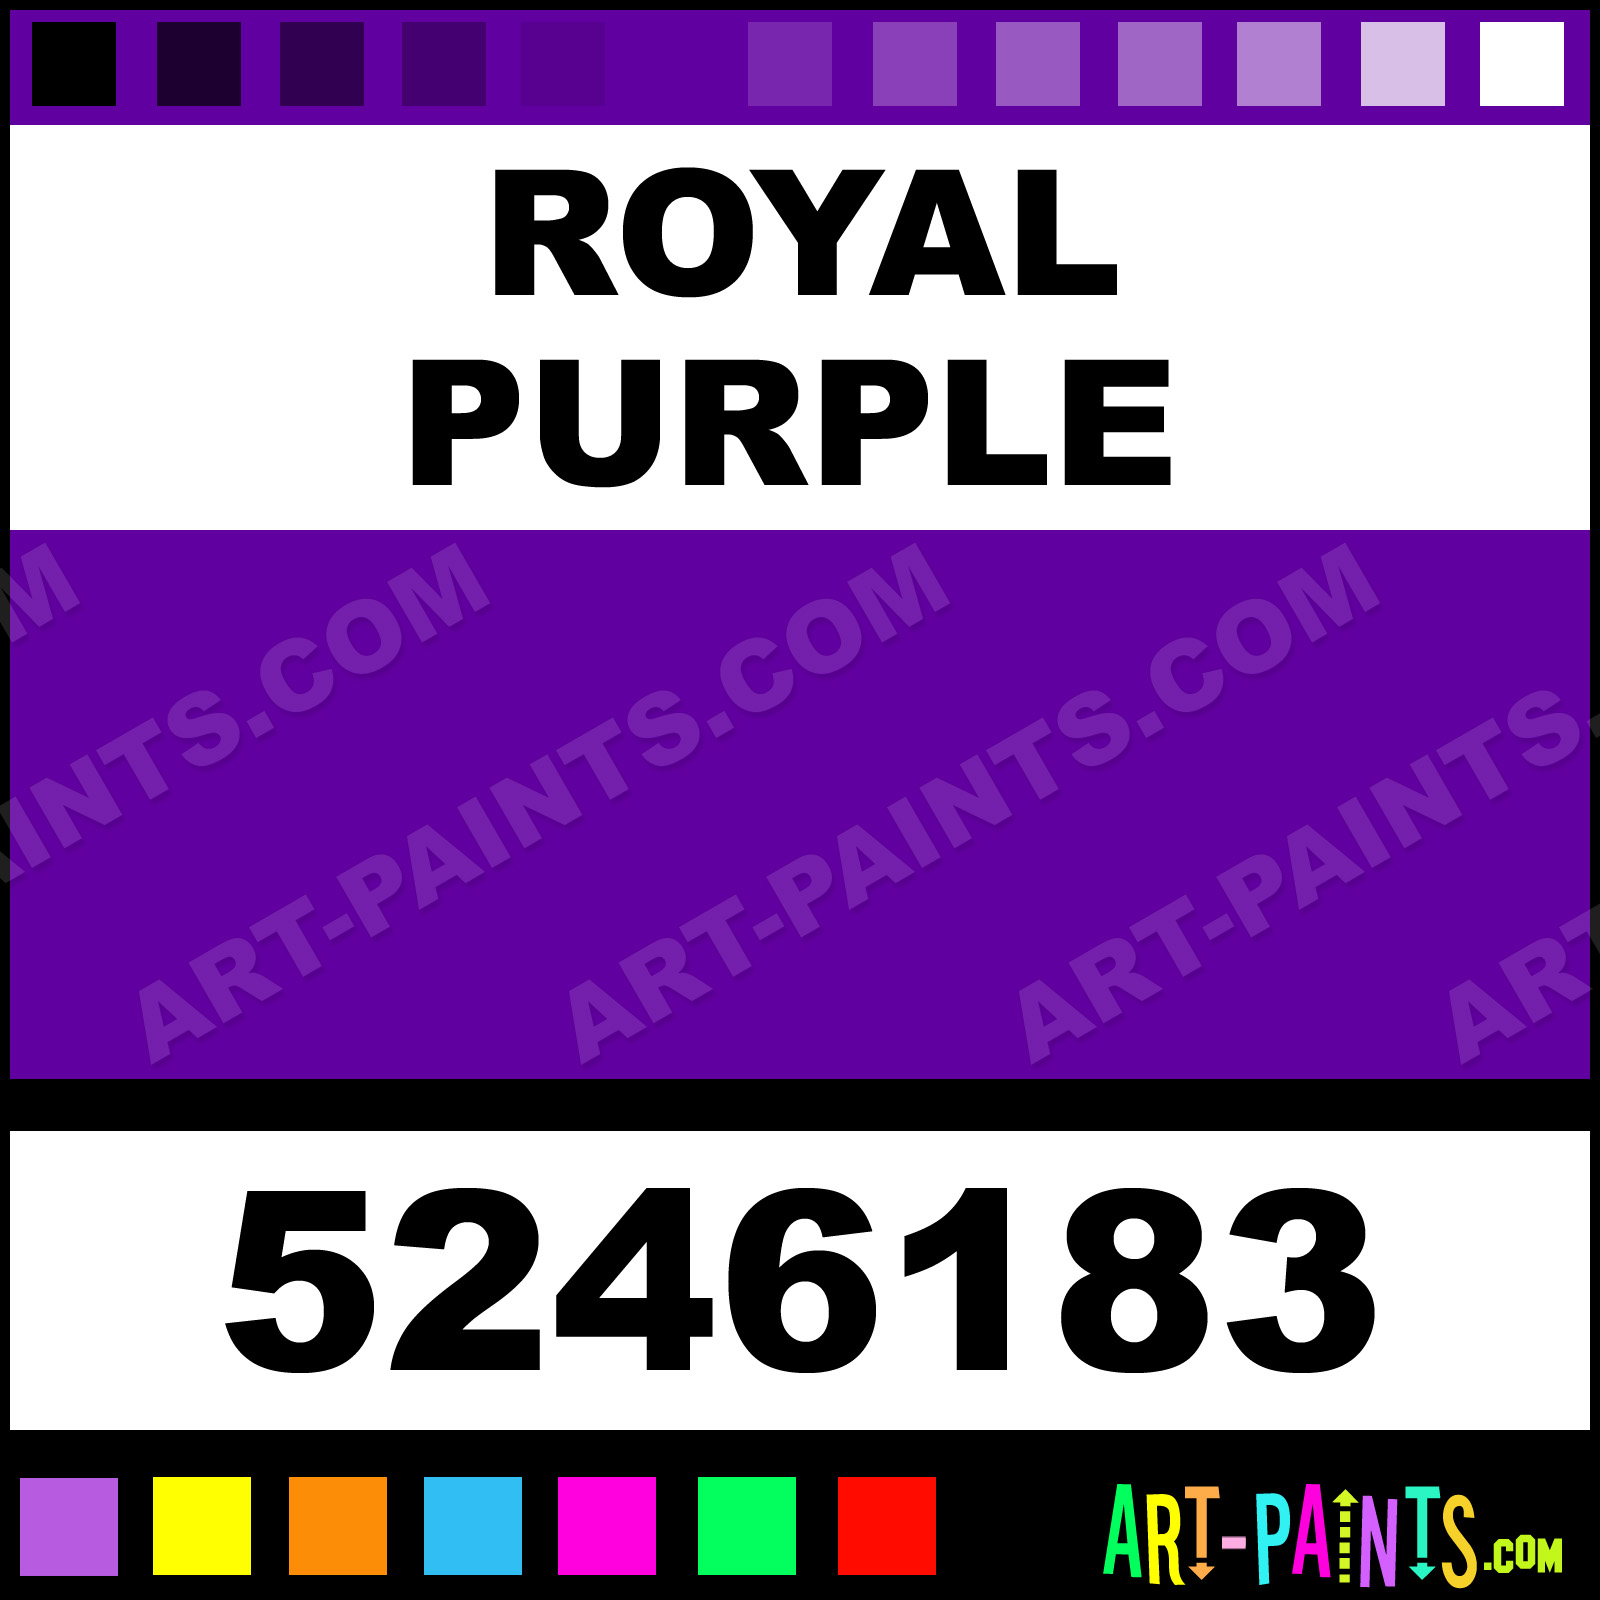 Royal Purple Dry Permenamel Stained Gl Window Paints 5246183 Paint Color Delta Air